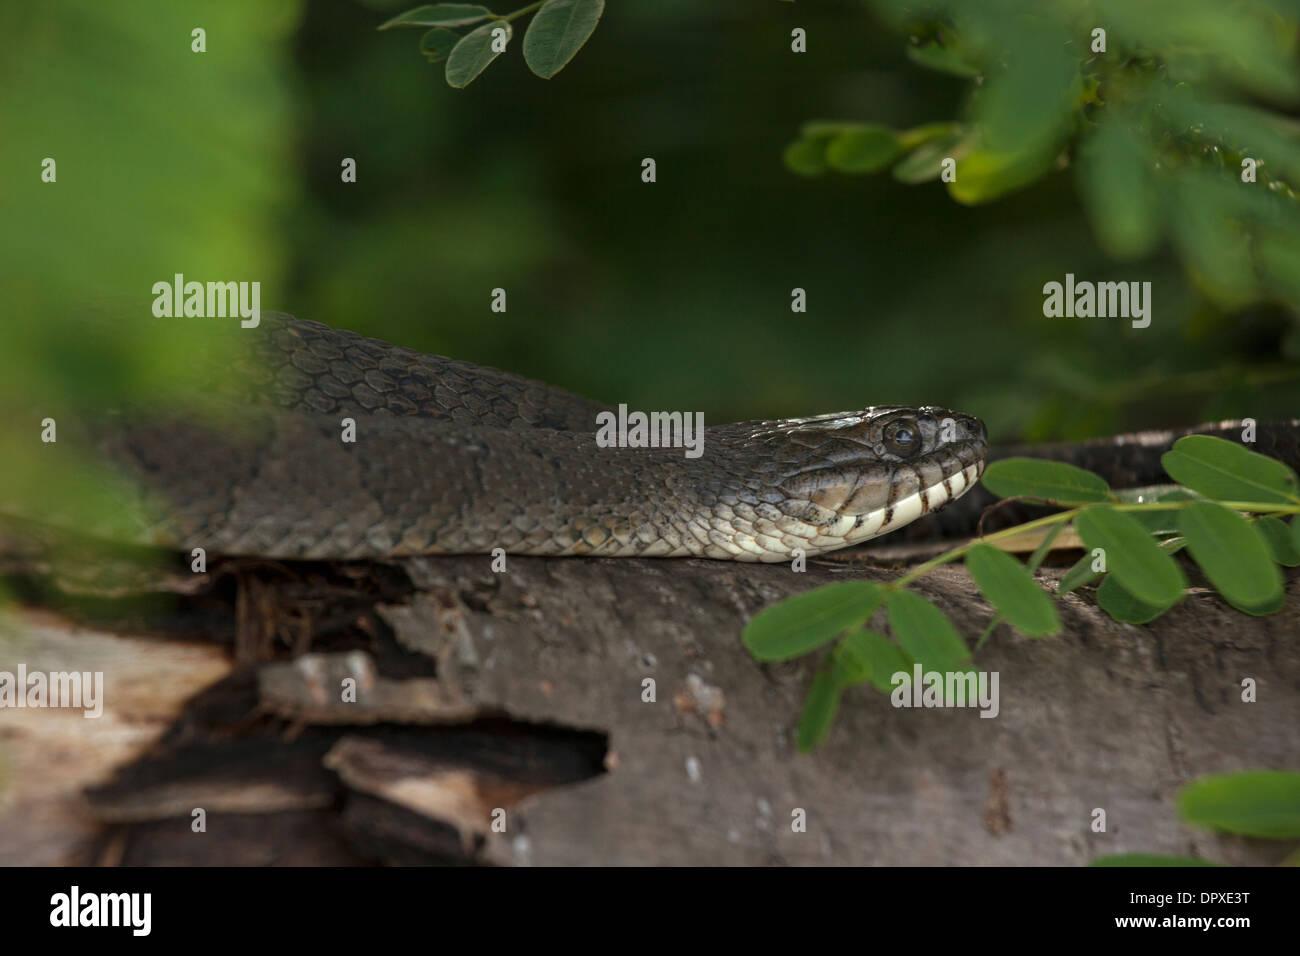 Northern water snake (Nerodia sipedon), New York, gravid female basking - Stock Image